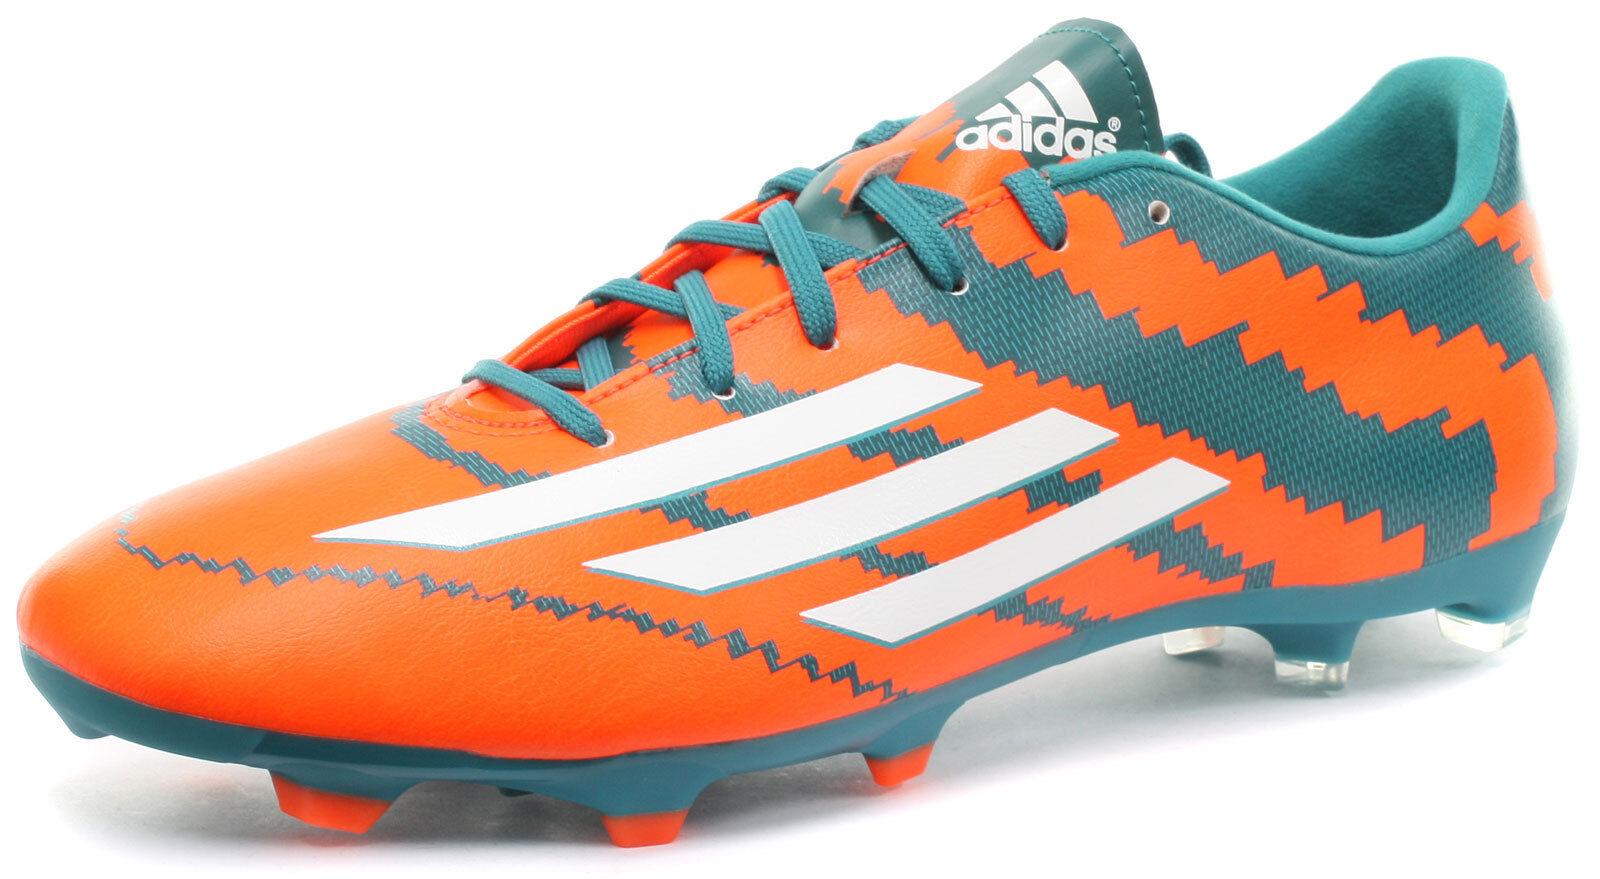 NUOVE shoes DA CALCIO ADIDAS MESSI 10.3 FG M29570 TAGLIA 42 2 3 - US 9